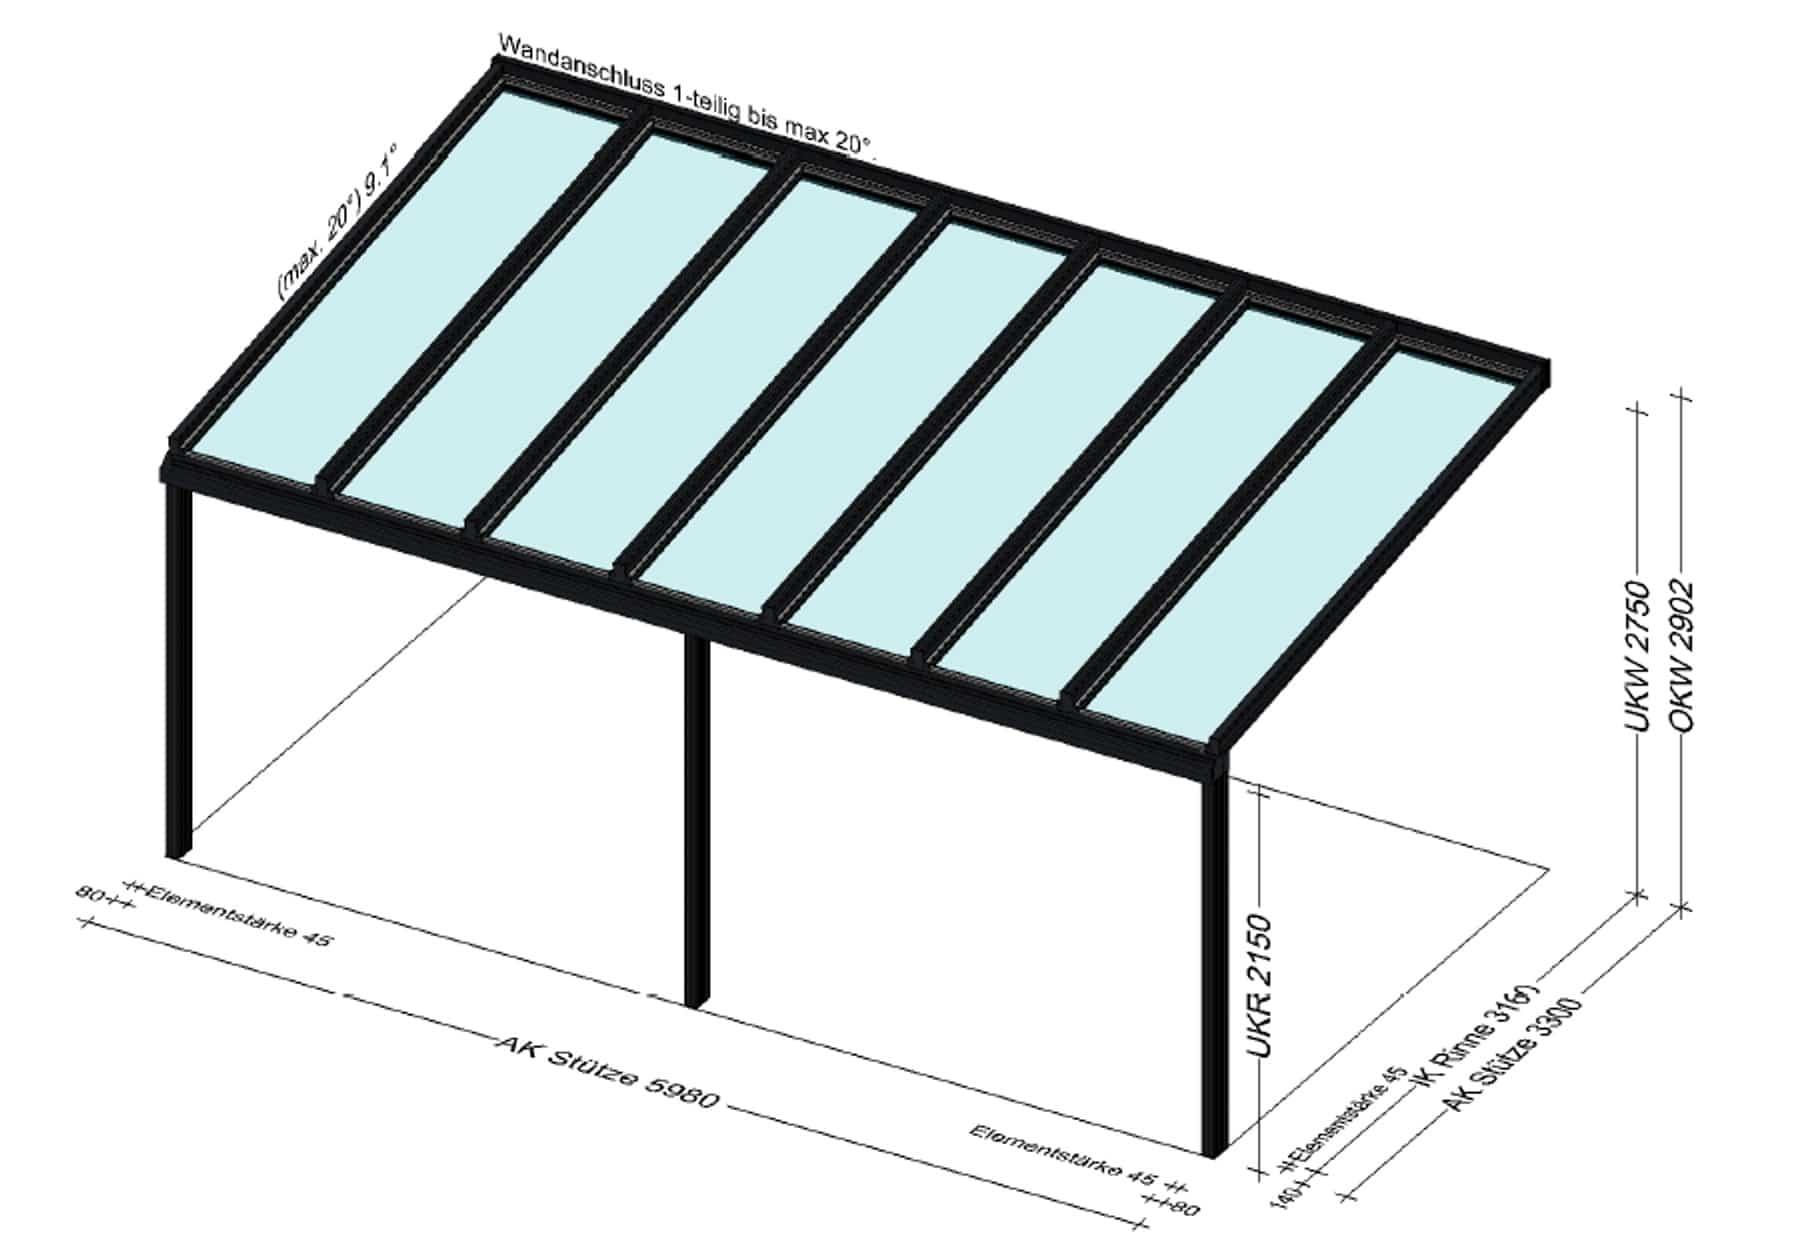 Schmidinger Terrassenüberdachung 6 x 3,3 Meter